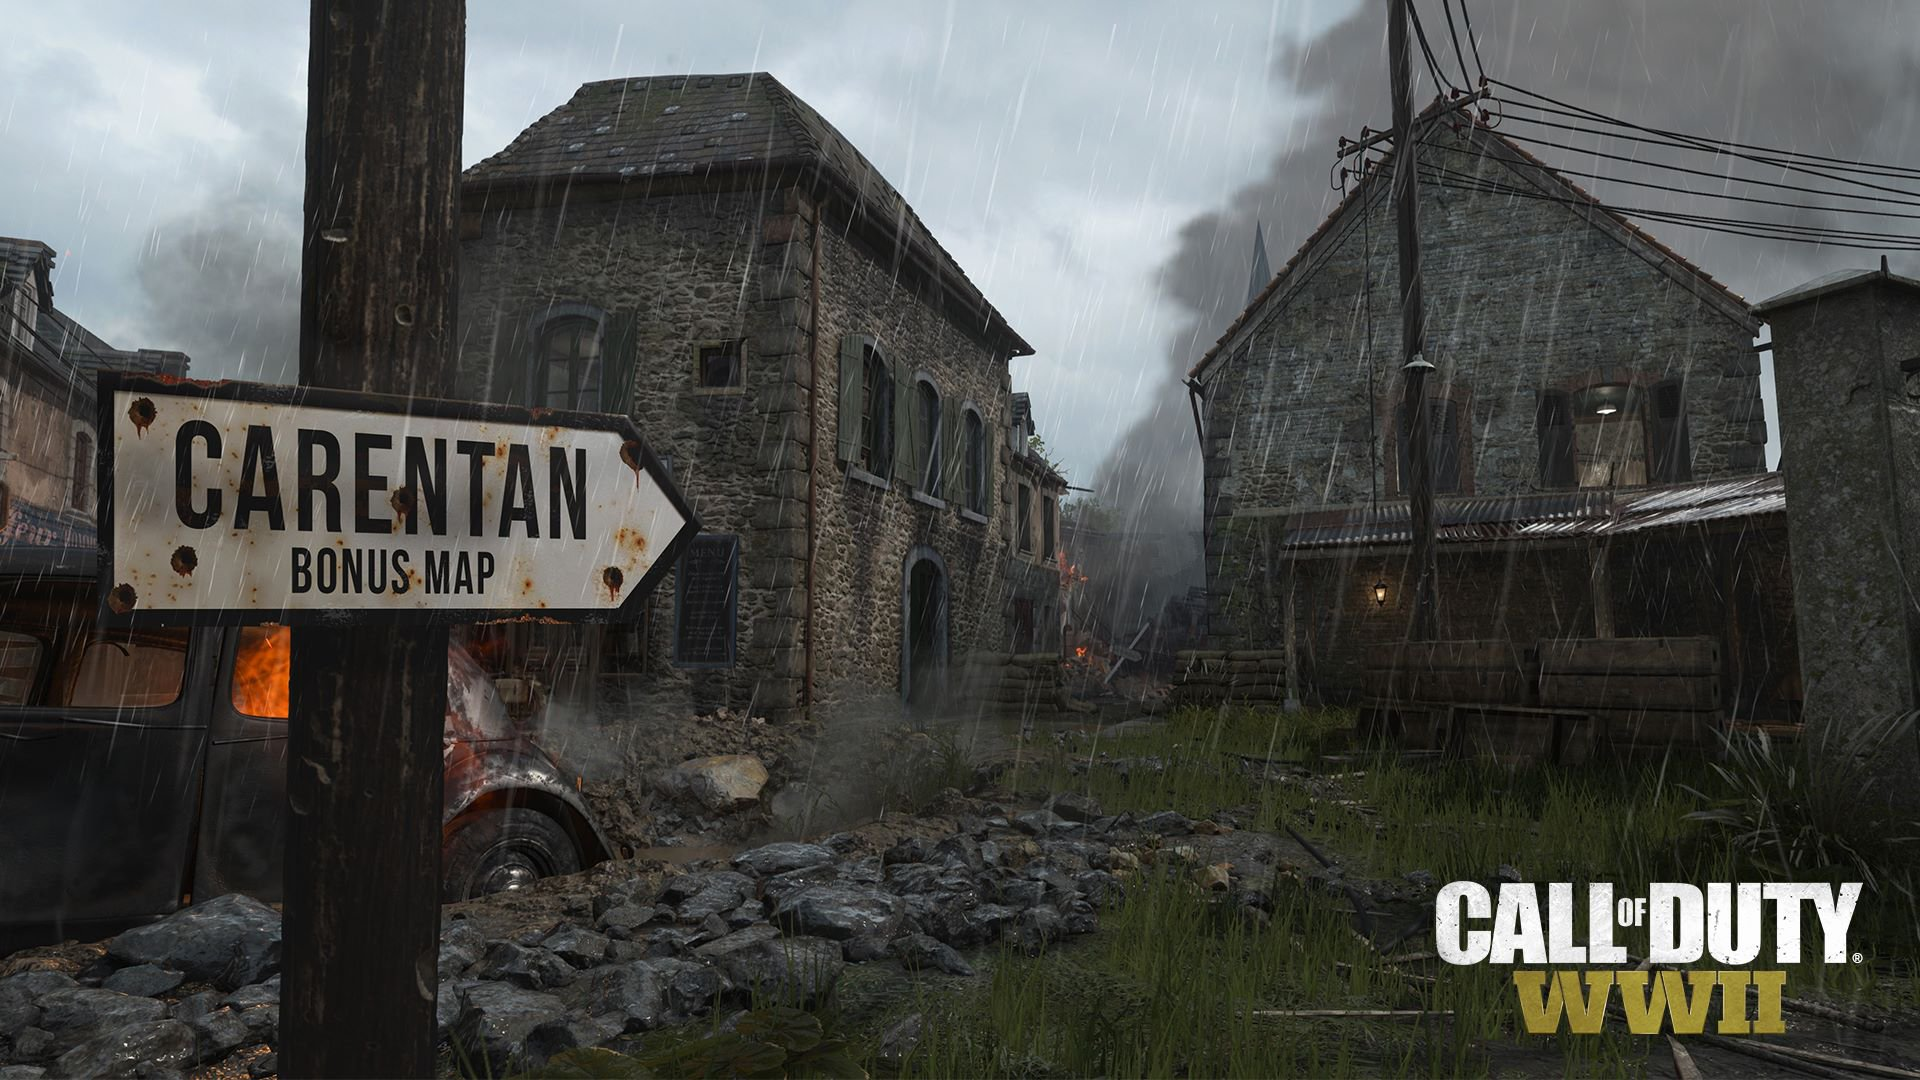 Call of Duty WW2 Carentan Bonus Map screenshot